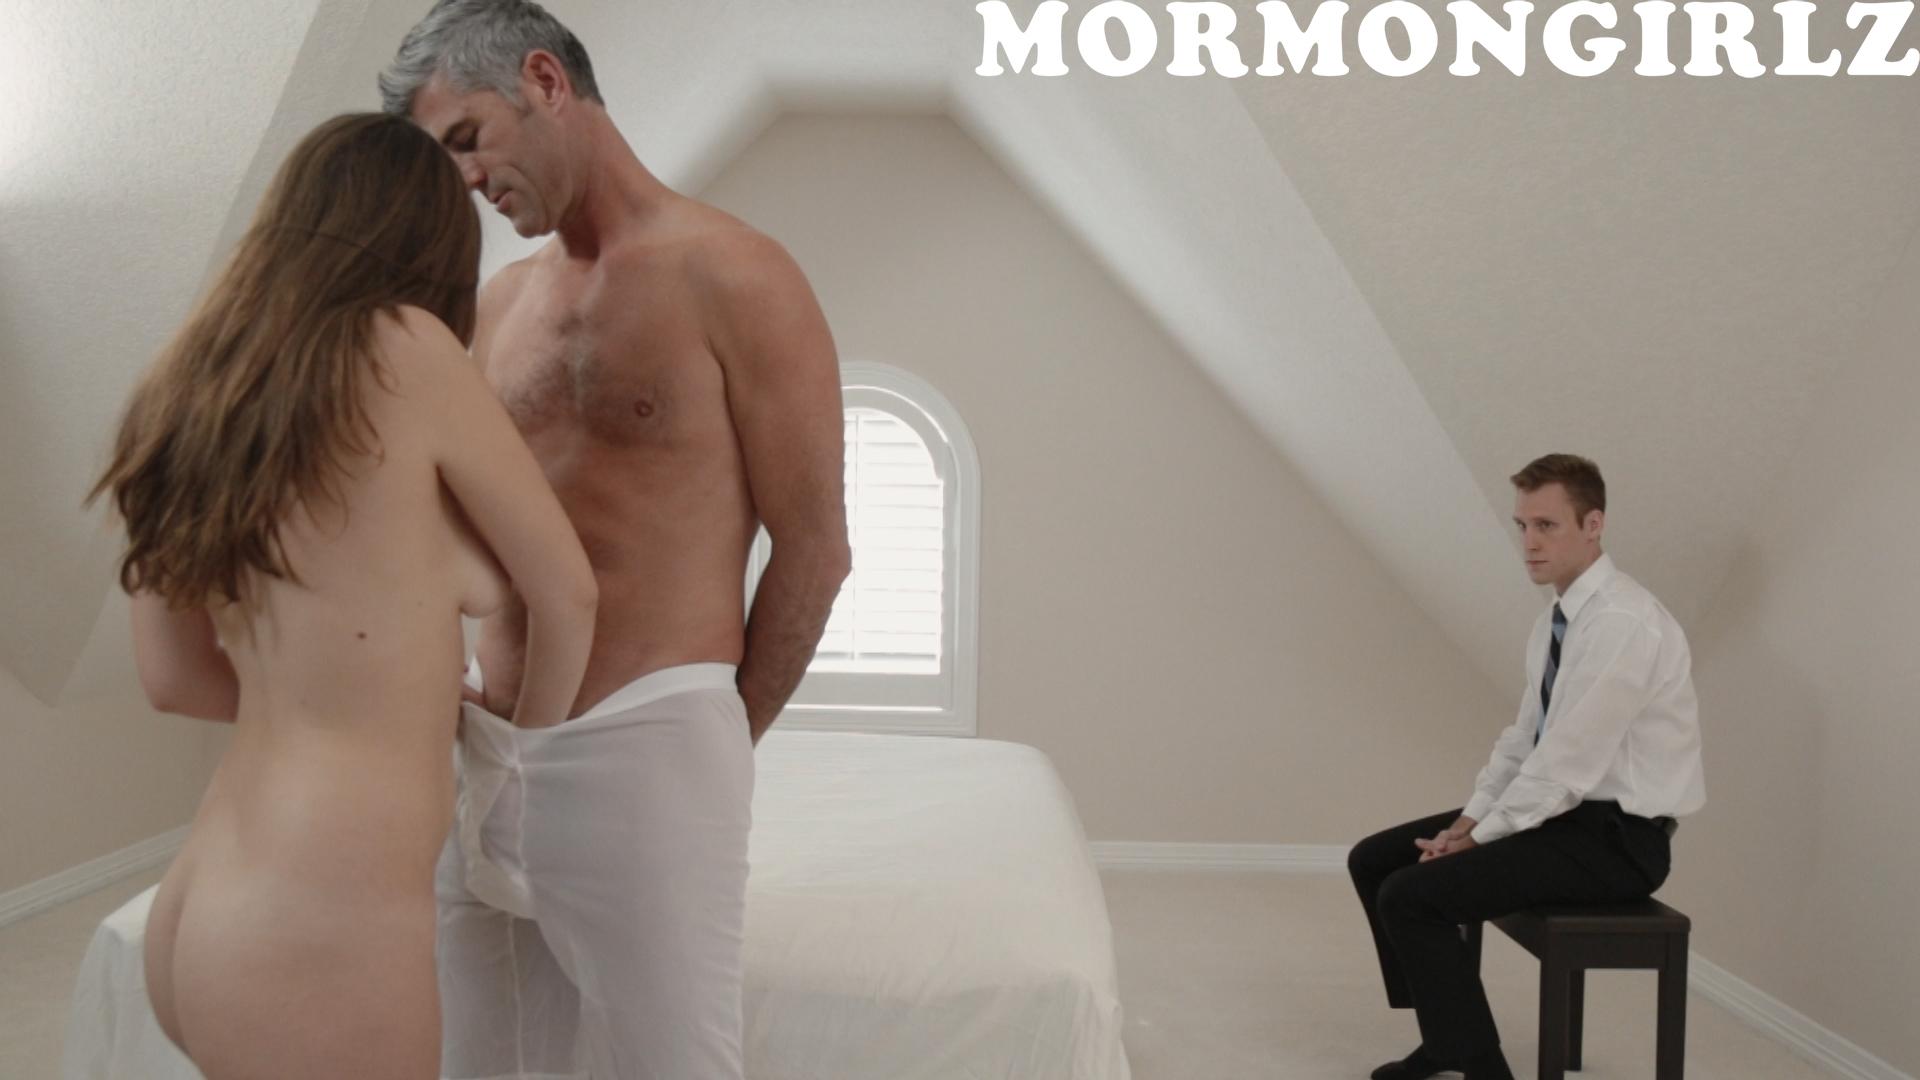 076_mormongirlz_0026